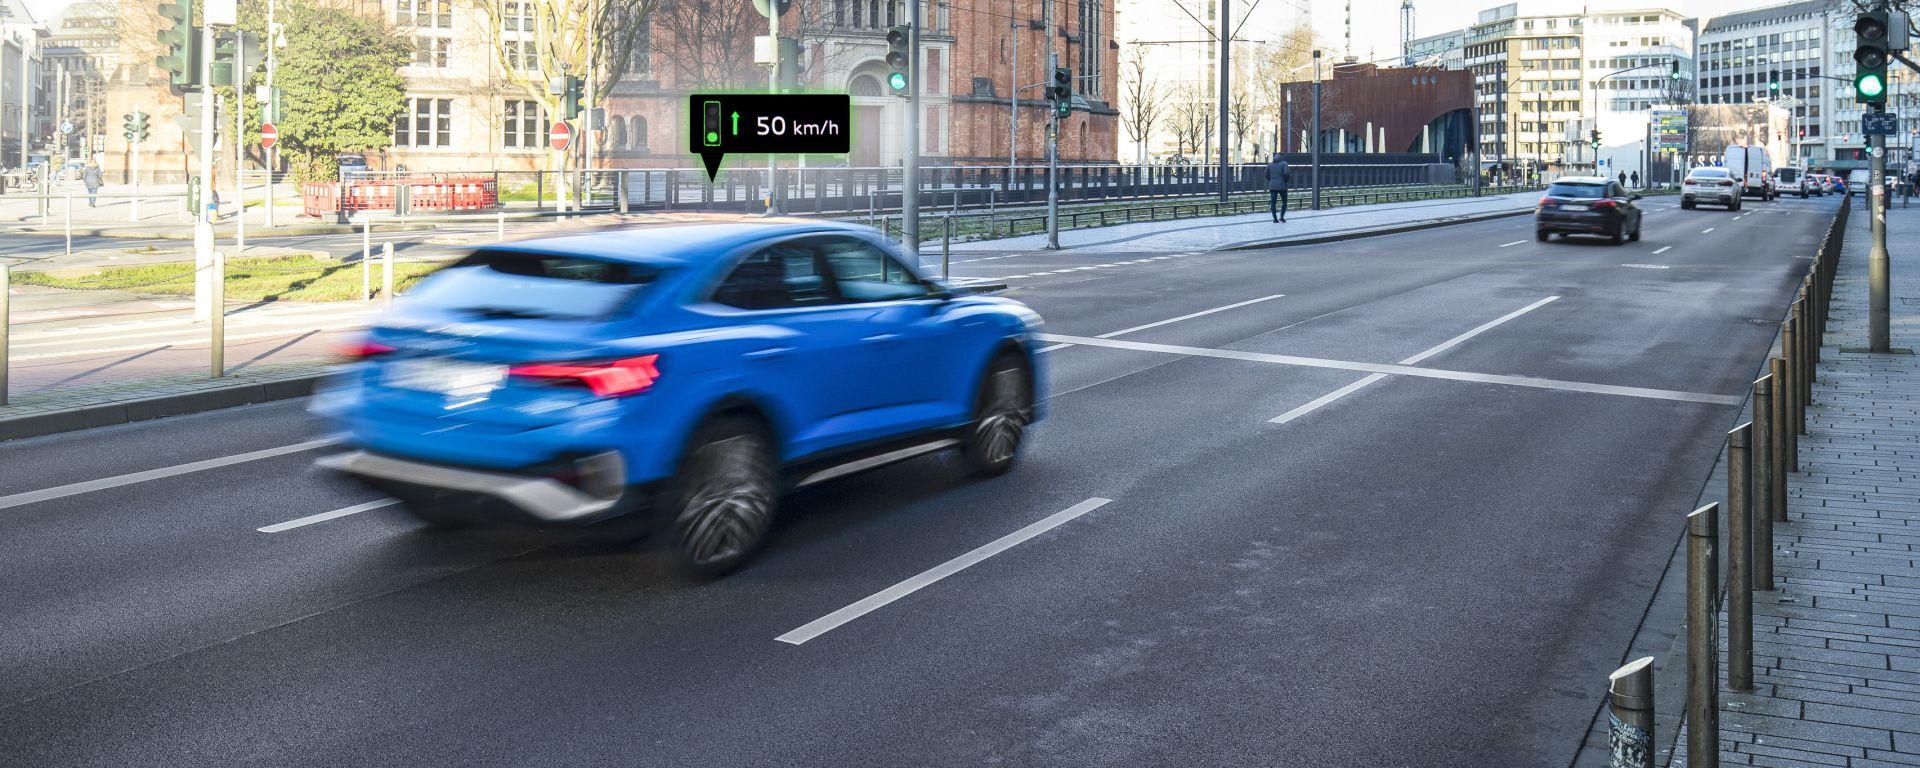 Audi Traffic Light Information system